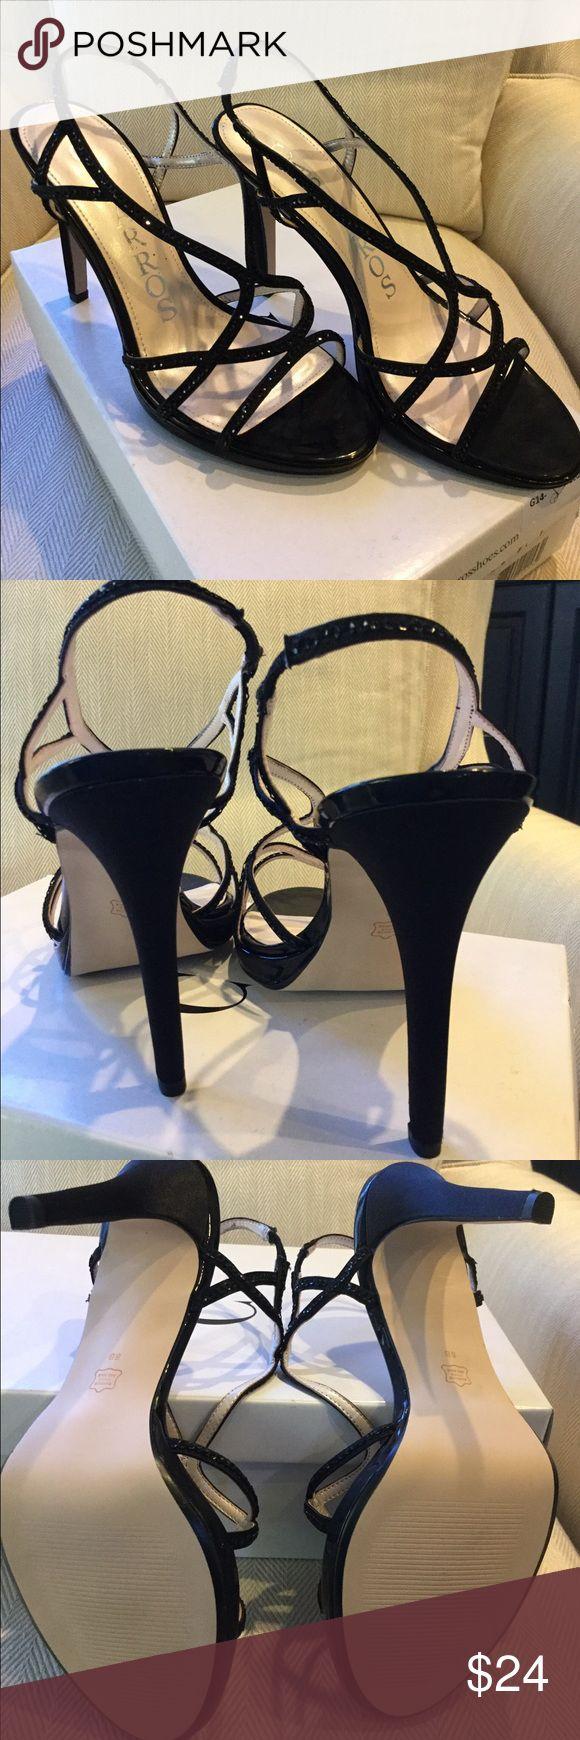 "Black satin sparkle Caparros special occasion shoe Black Satin Zarielle shoe. New with box. Size 8M. Sparkles on straps. Heel approx. 5"" with .25""-.5"" platform. Caparros Shoes Heels"